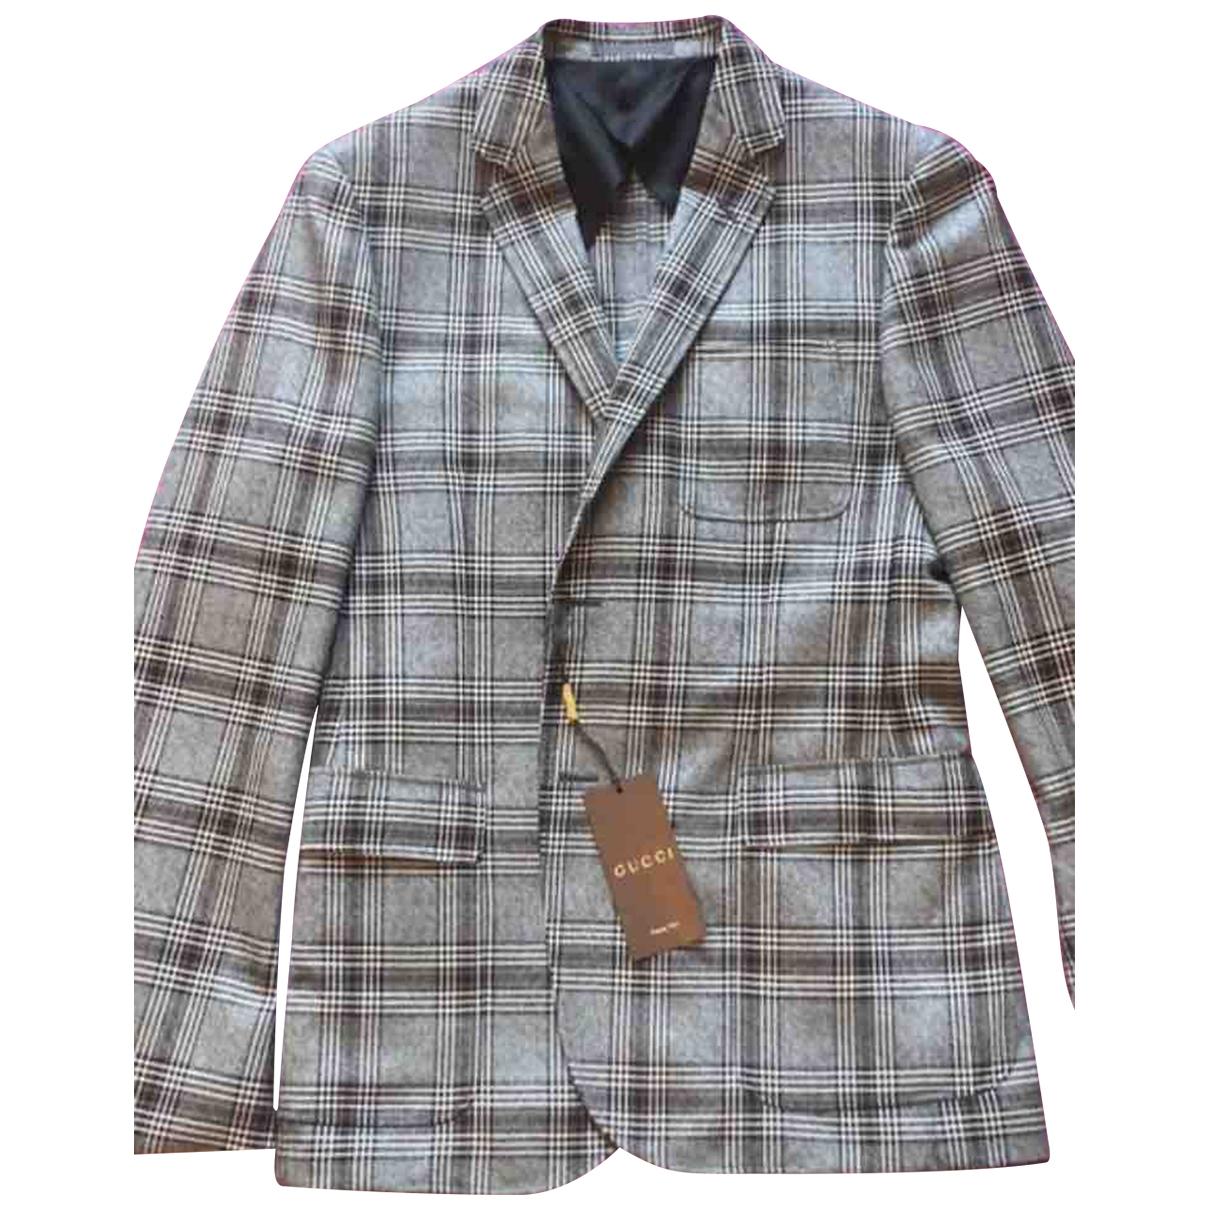 Gucci \N Jacke in  Grau Wolle